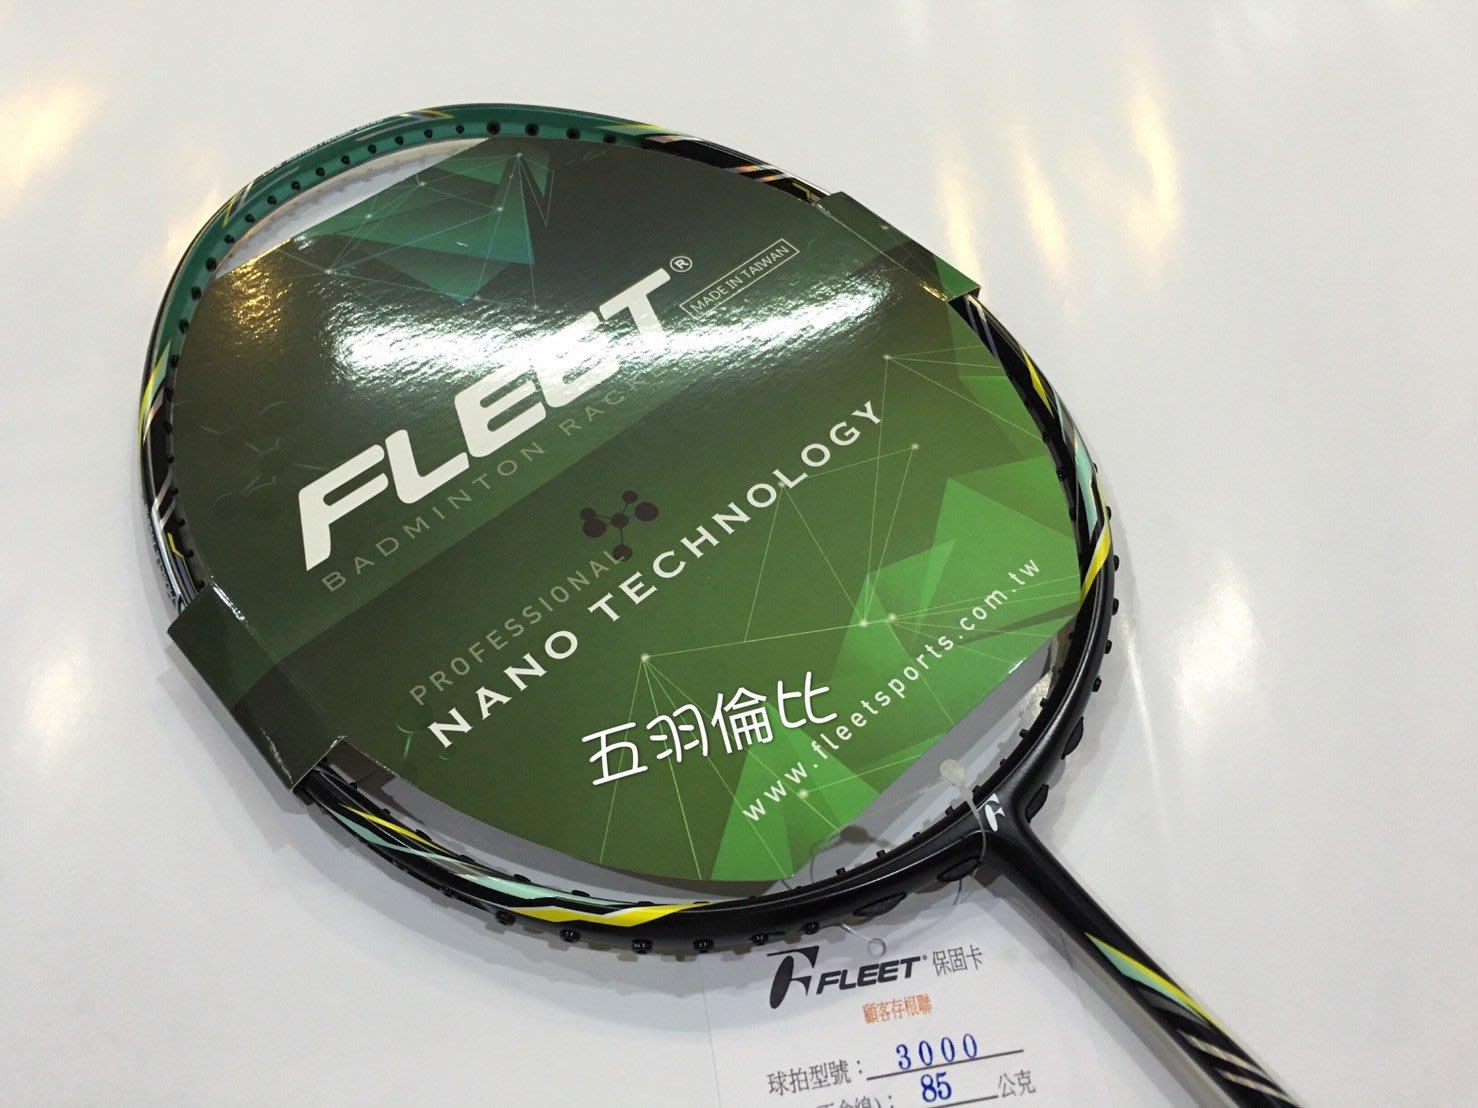 【五羽倫比】FLEET 富力特 PROFESSIONAL 3000VII PROFESSIONAL3000VII 羽球拍